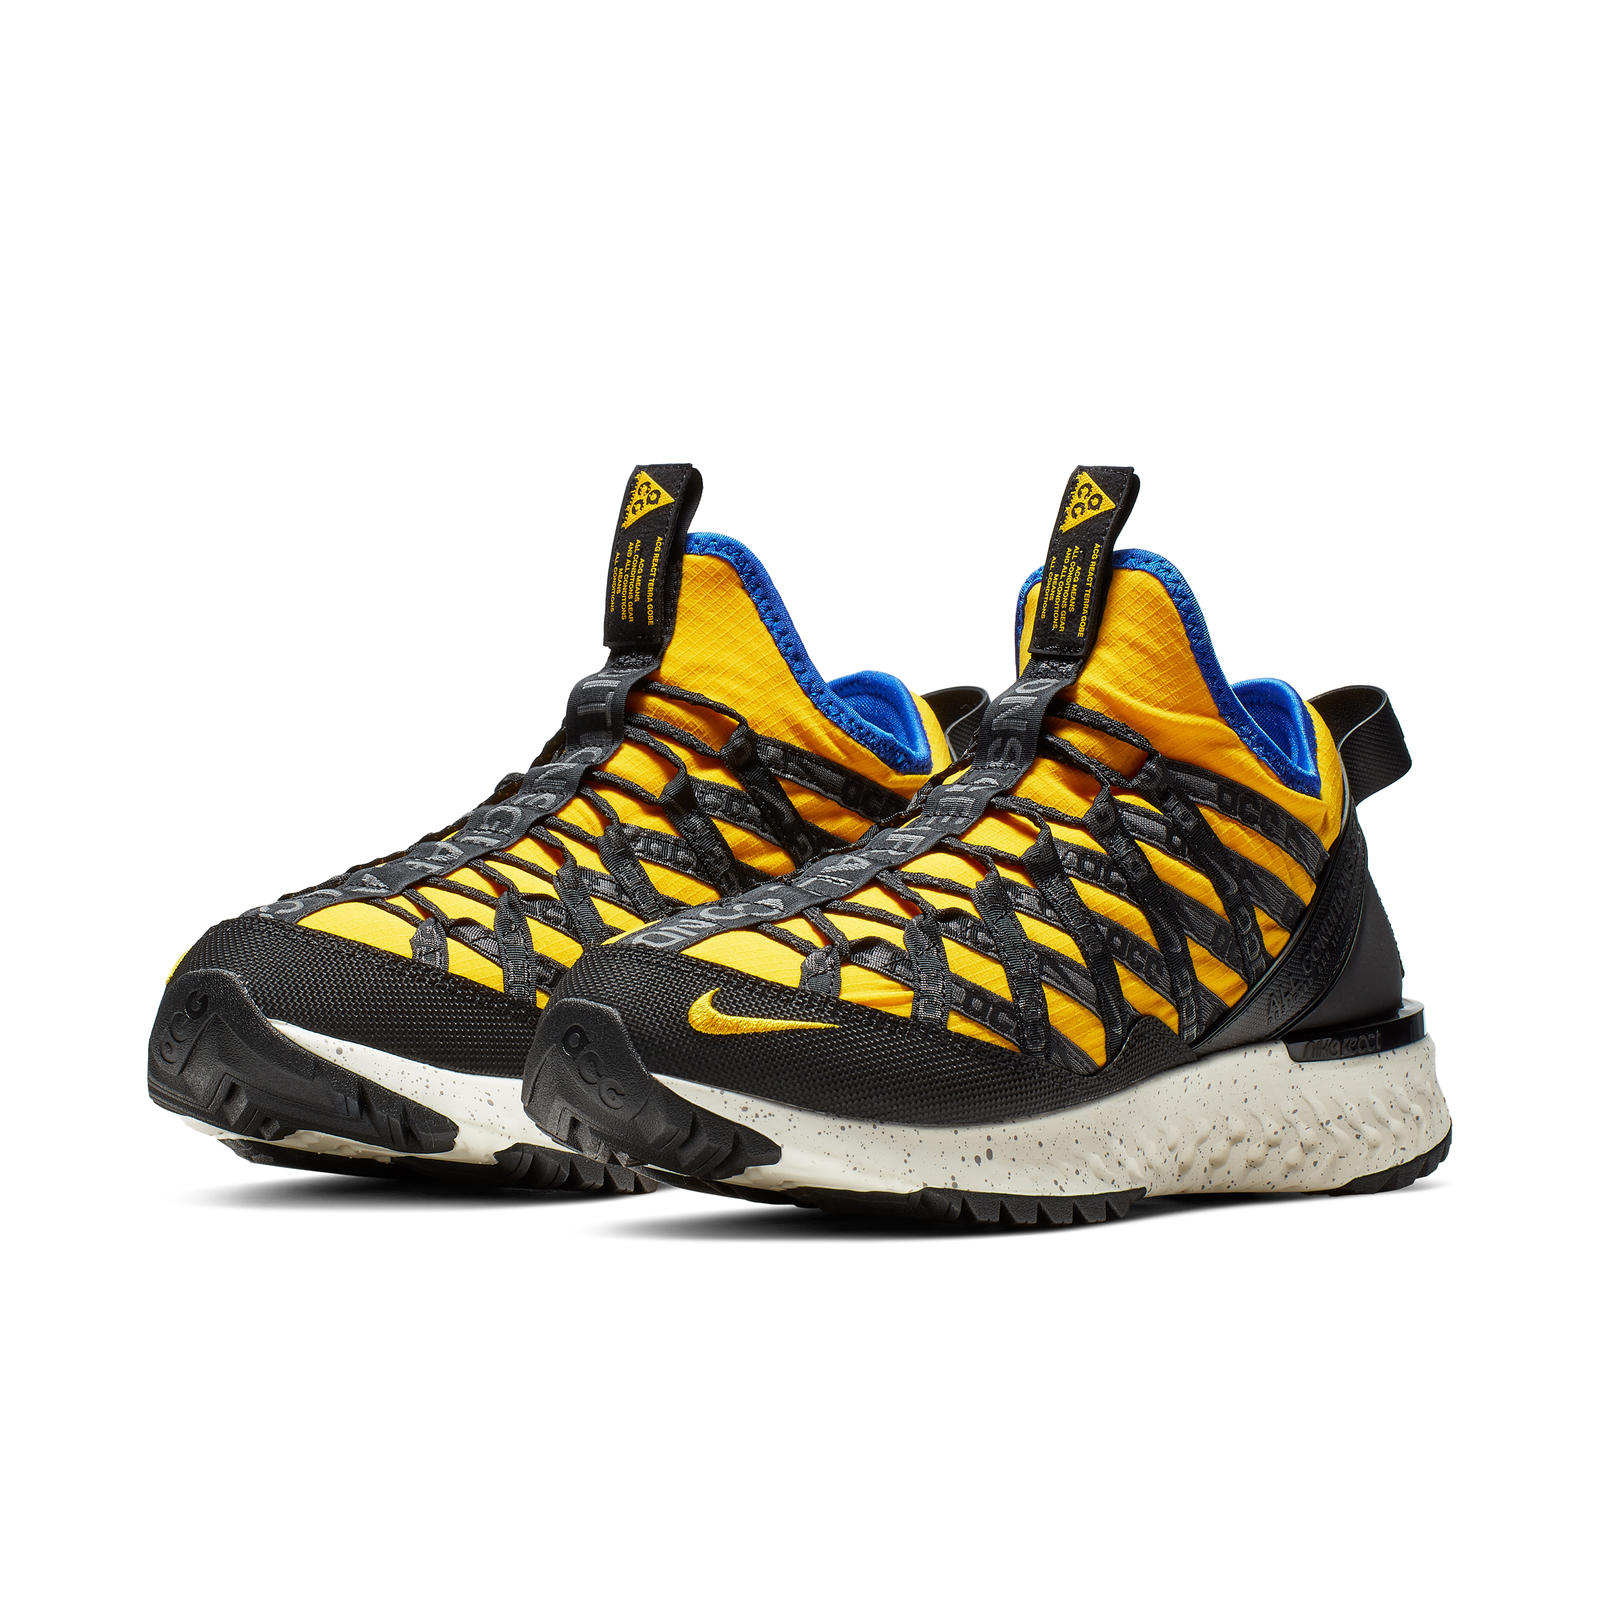 Nikeアウトドアライン新作スニーカー<br>REACT TERRA GOBE